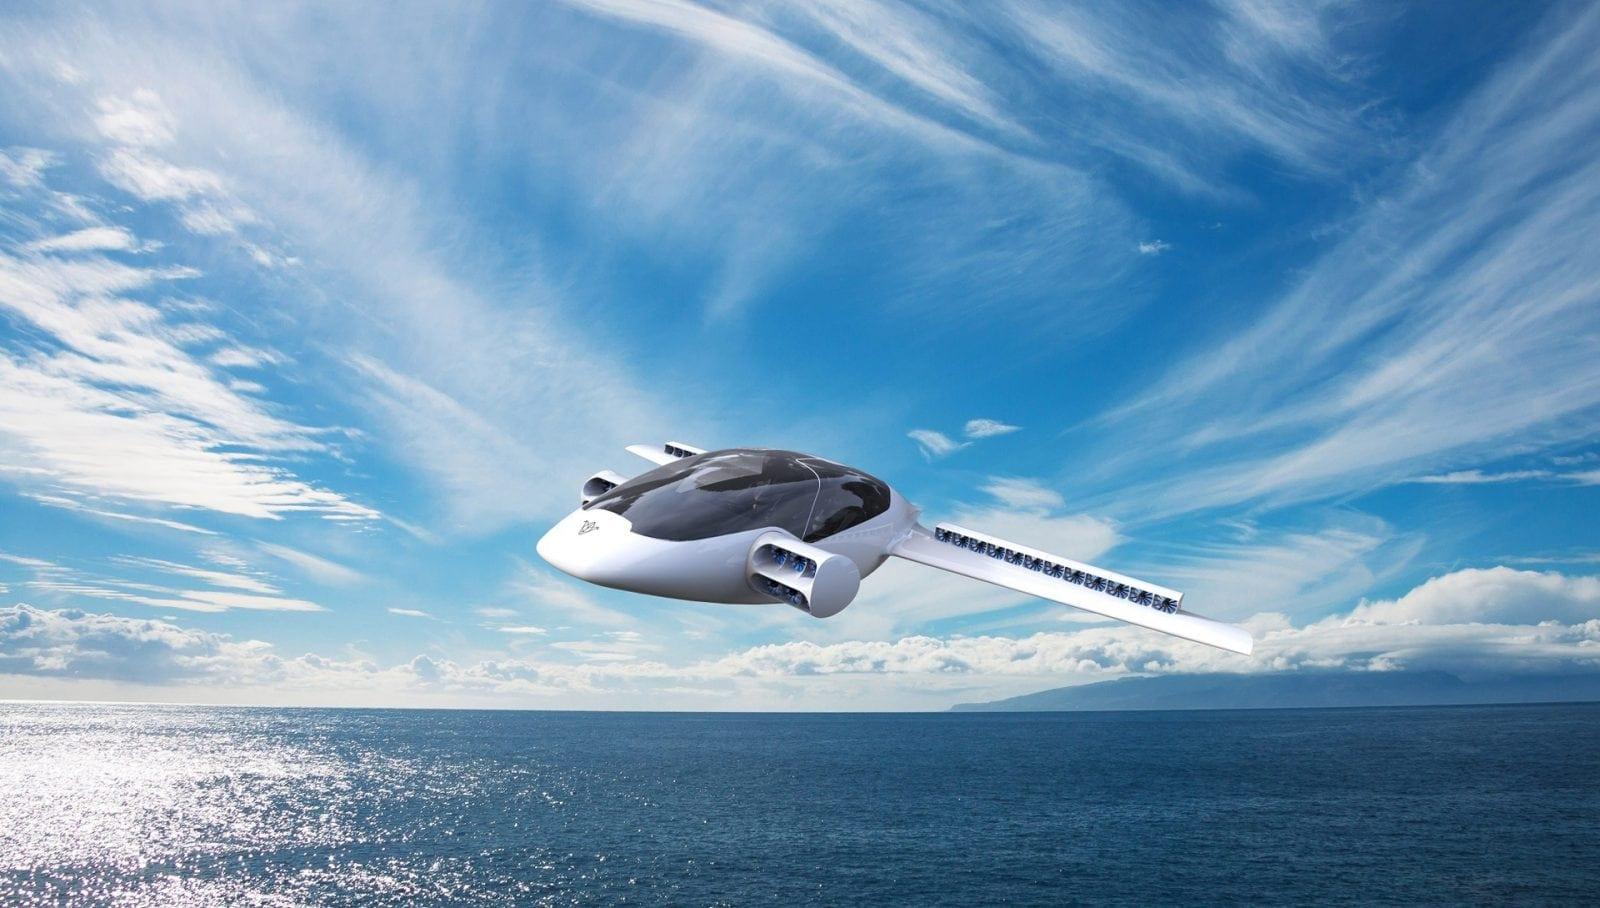 Lilium aircraft - Lilium Aircraft - Viitorul aviației la nivel personal